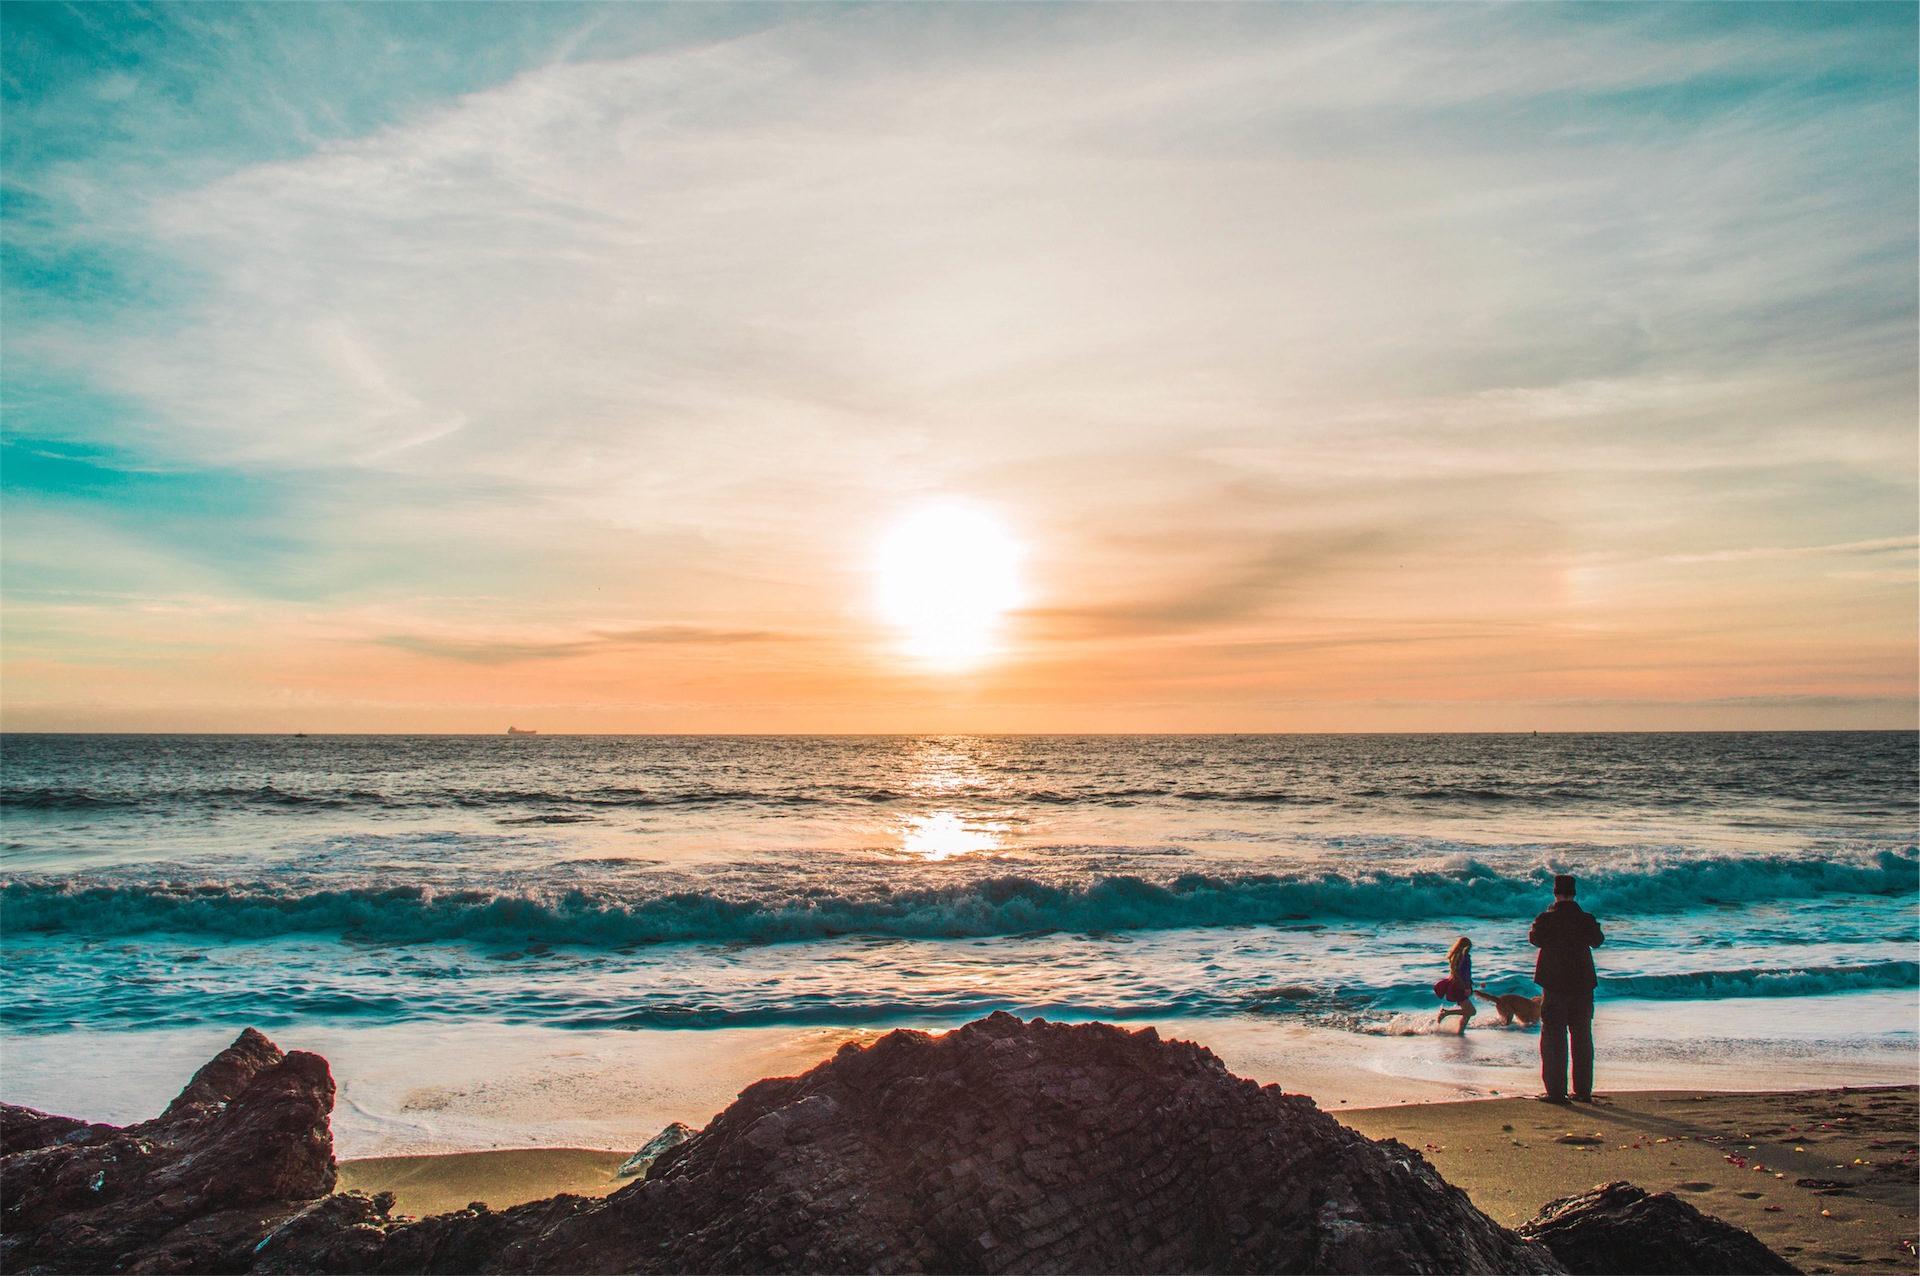 playa, sol, atardecer, mar, juego - Fondos de Pantalla HD - professor-falken.com